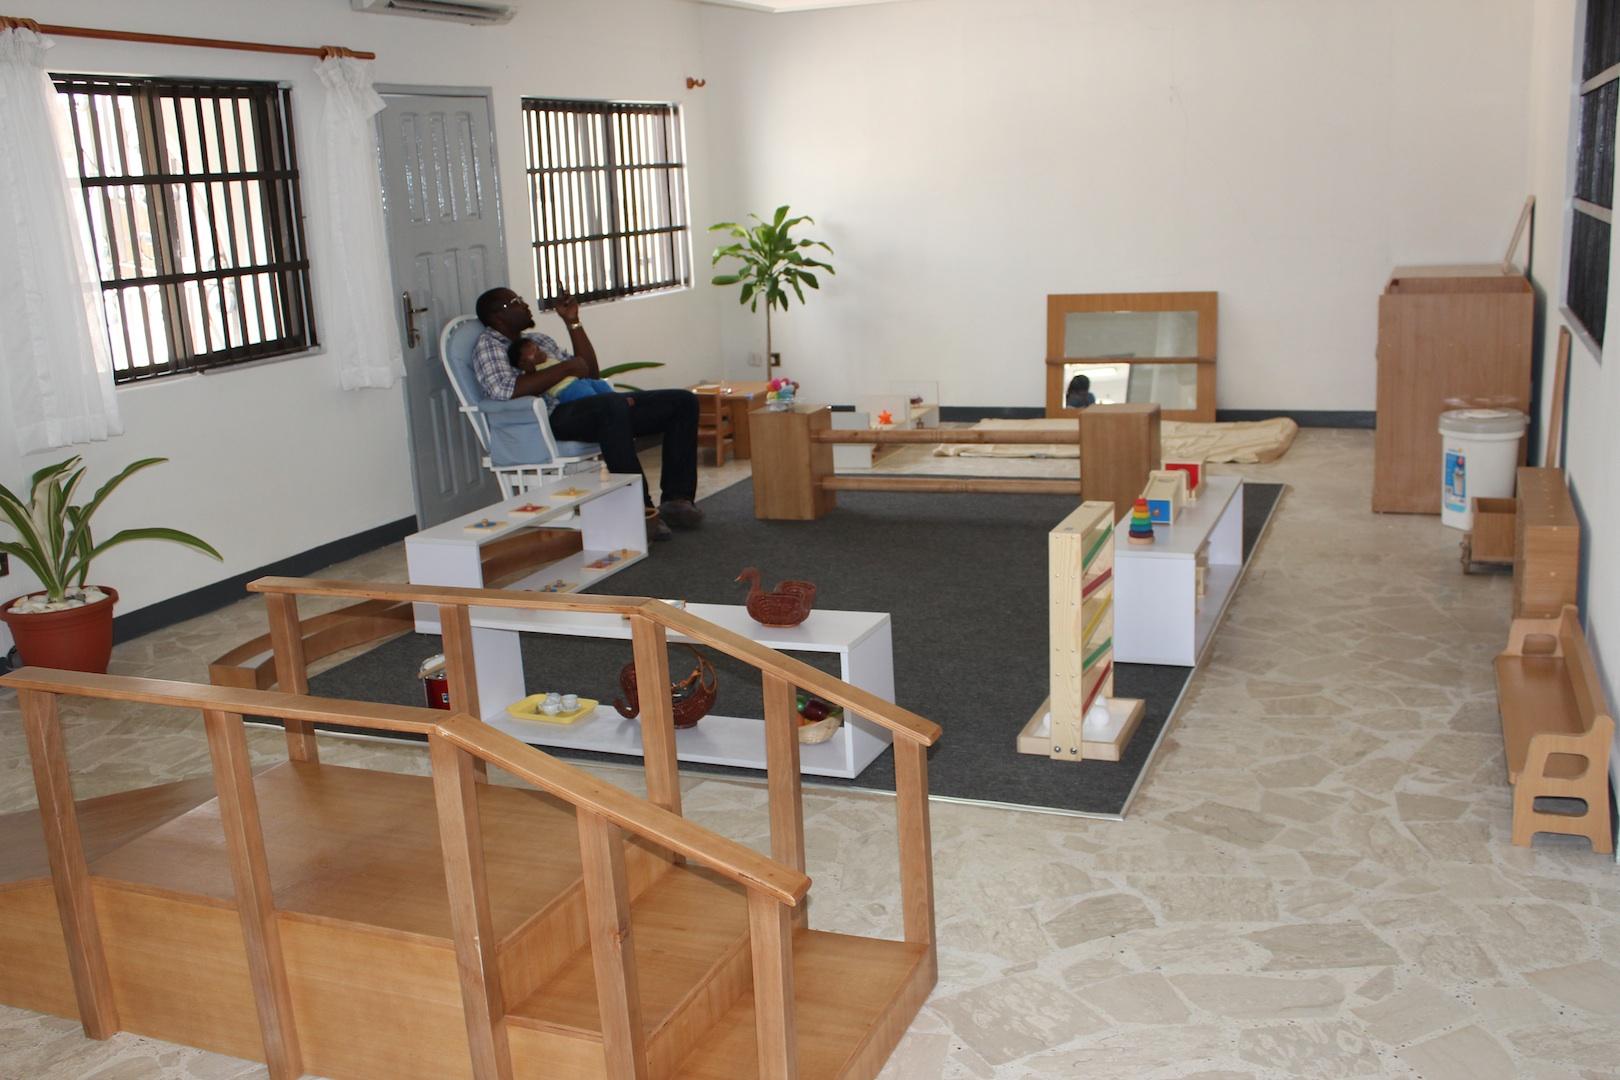 Choosing A Montessori School The Materials Nduoma